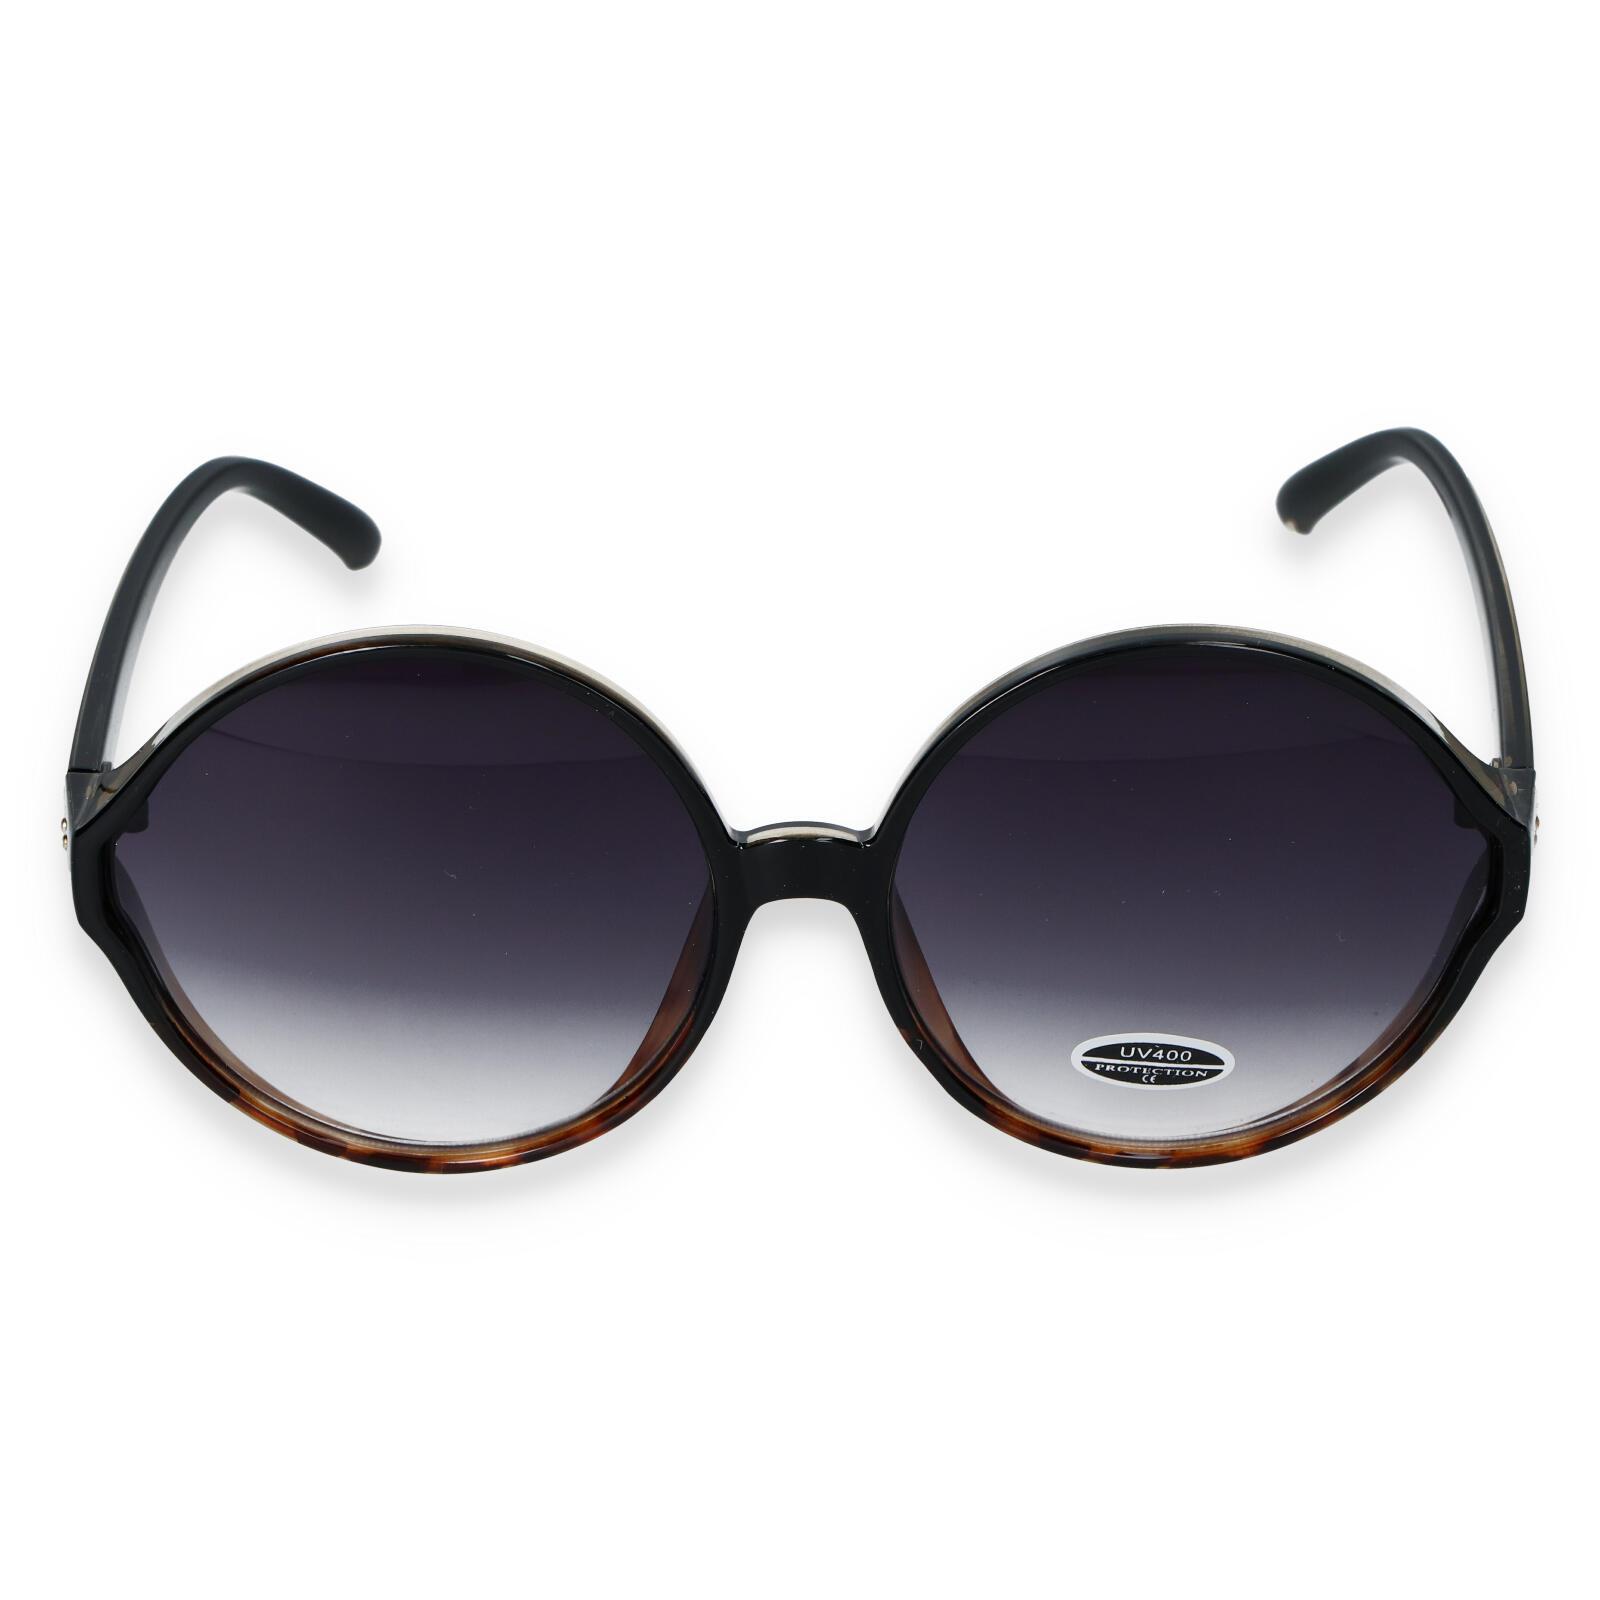 Dámske slnečné okuliare čiernohnedé - S9505